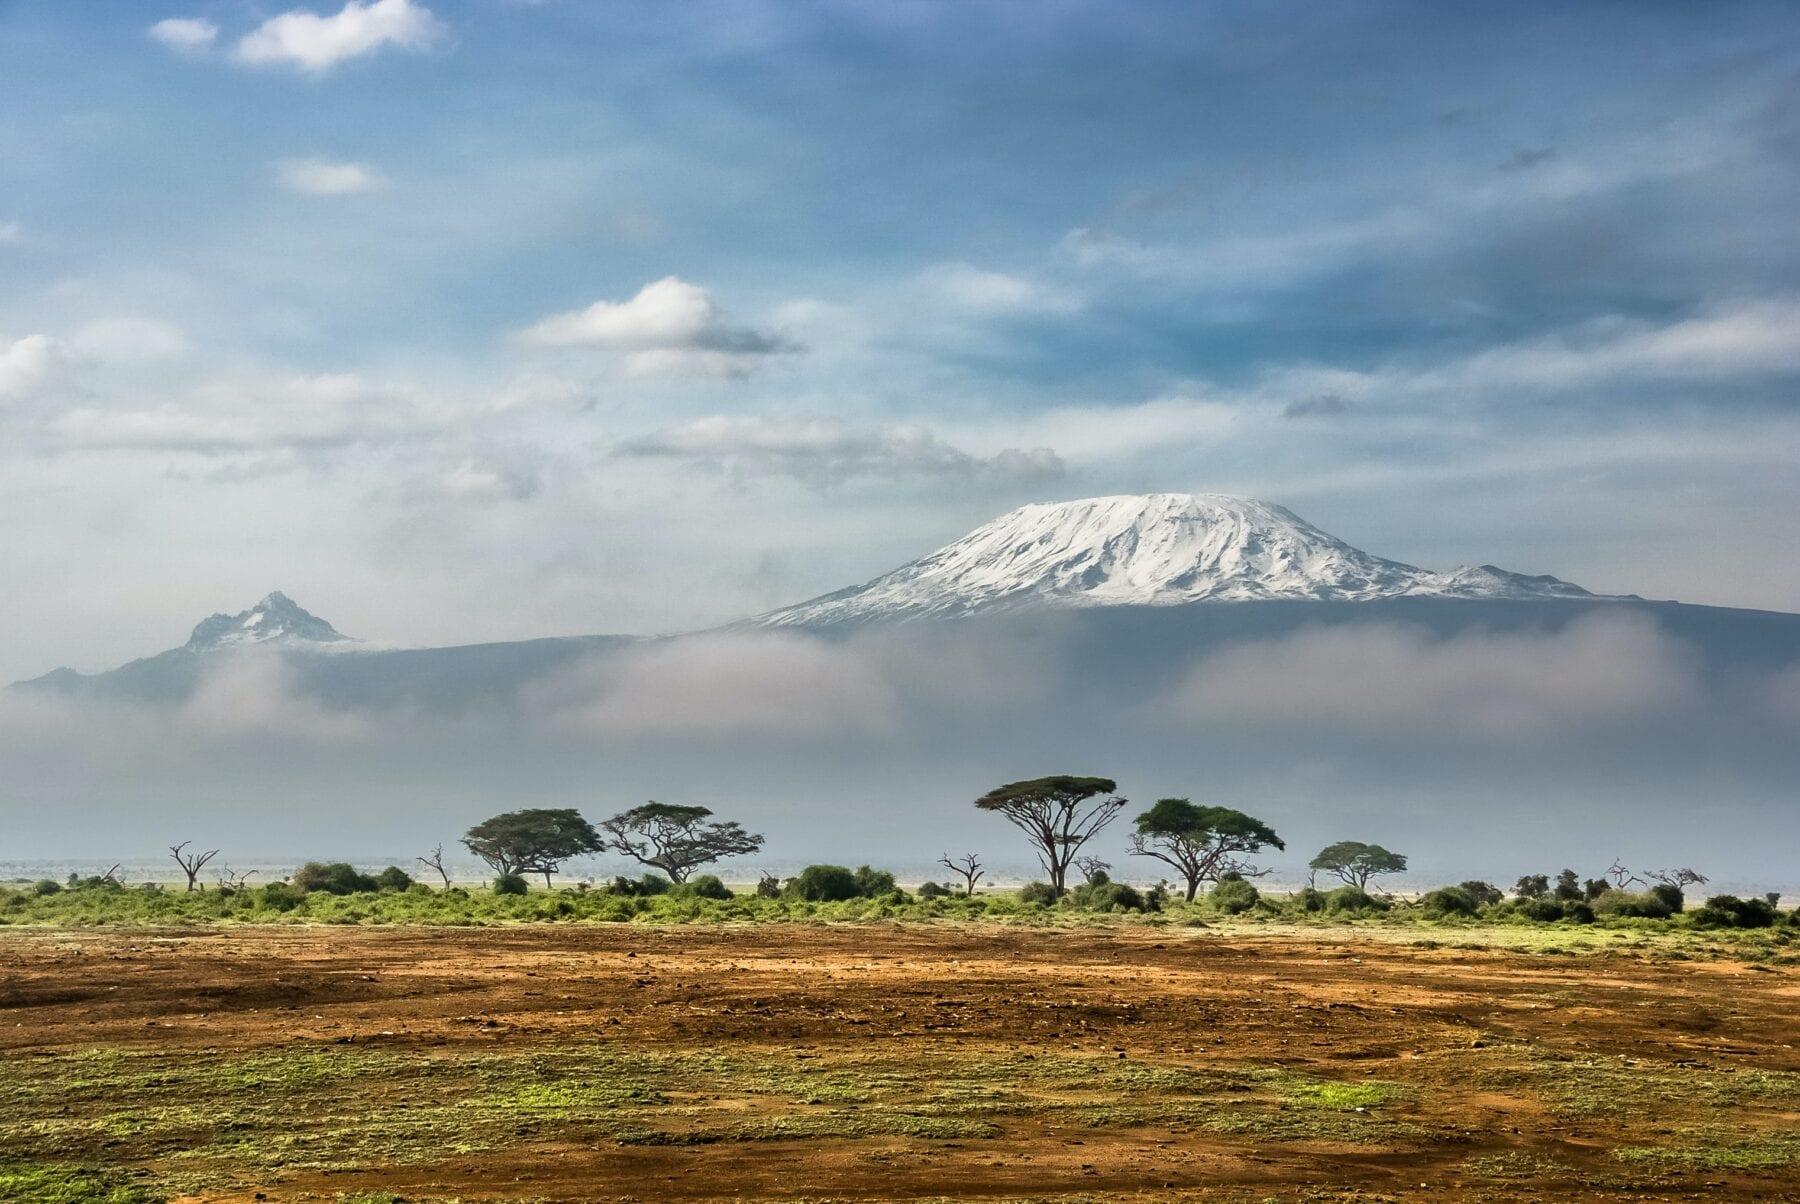 Kilimanjaro brand